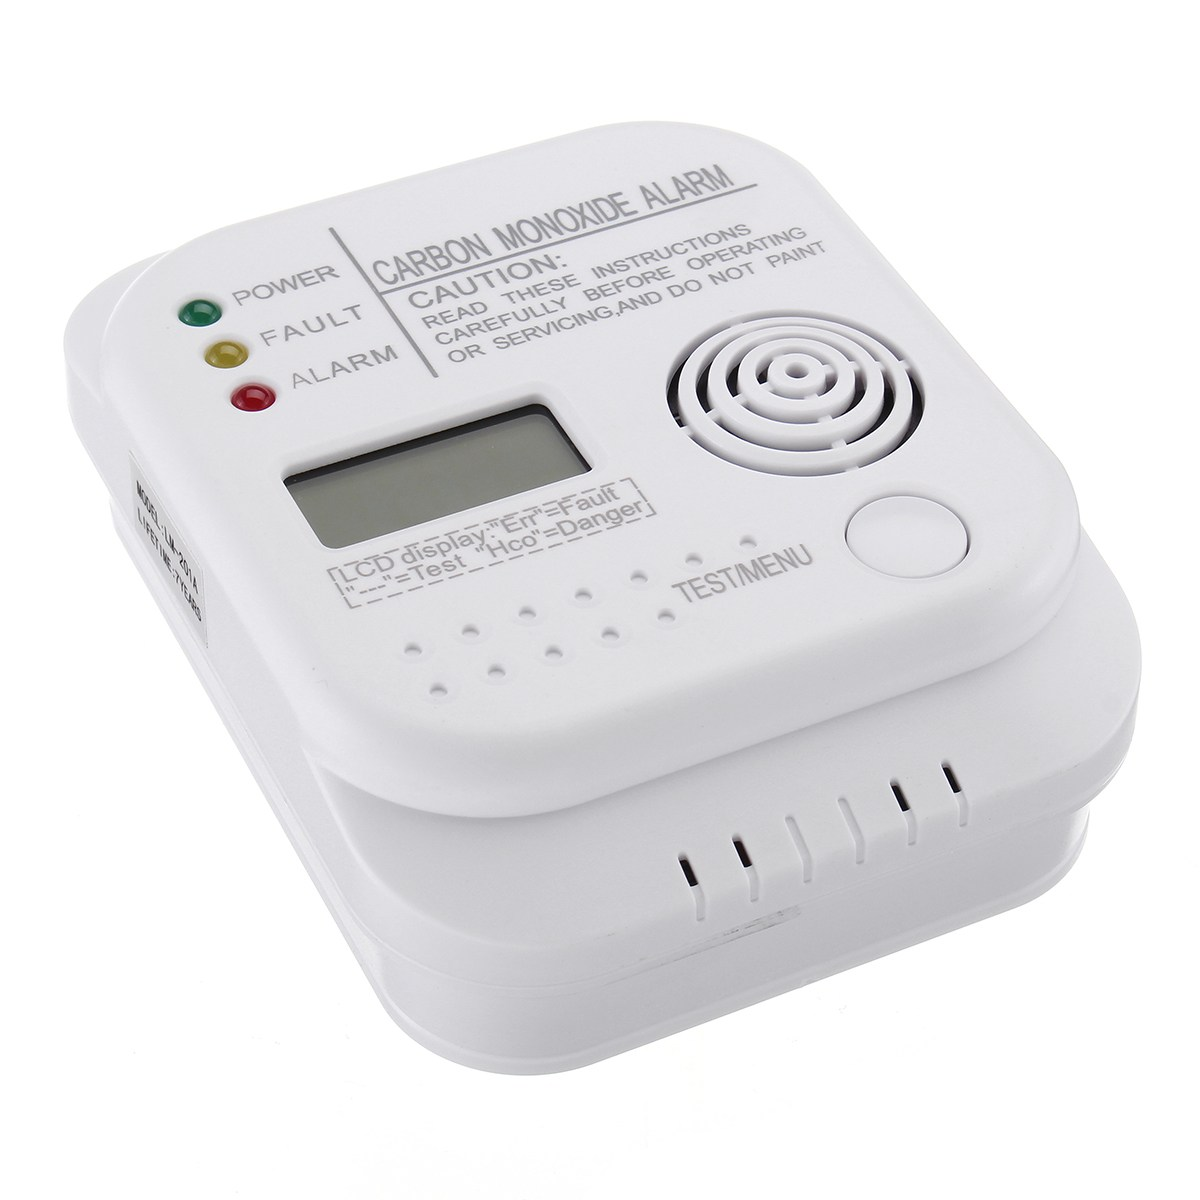 NEUE Safurance CO Kohlenmonoxid-warnung Detektor LCD Digital Home Security Indepedent Sensor Sicherheit